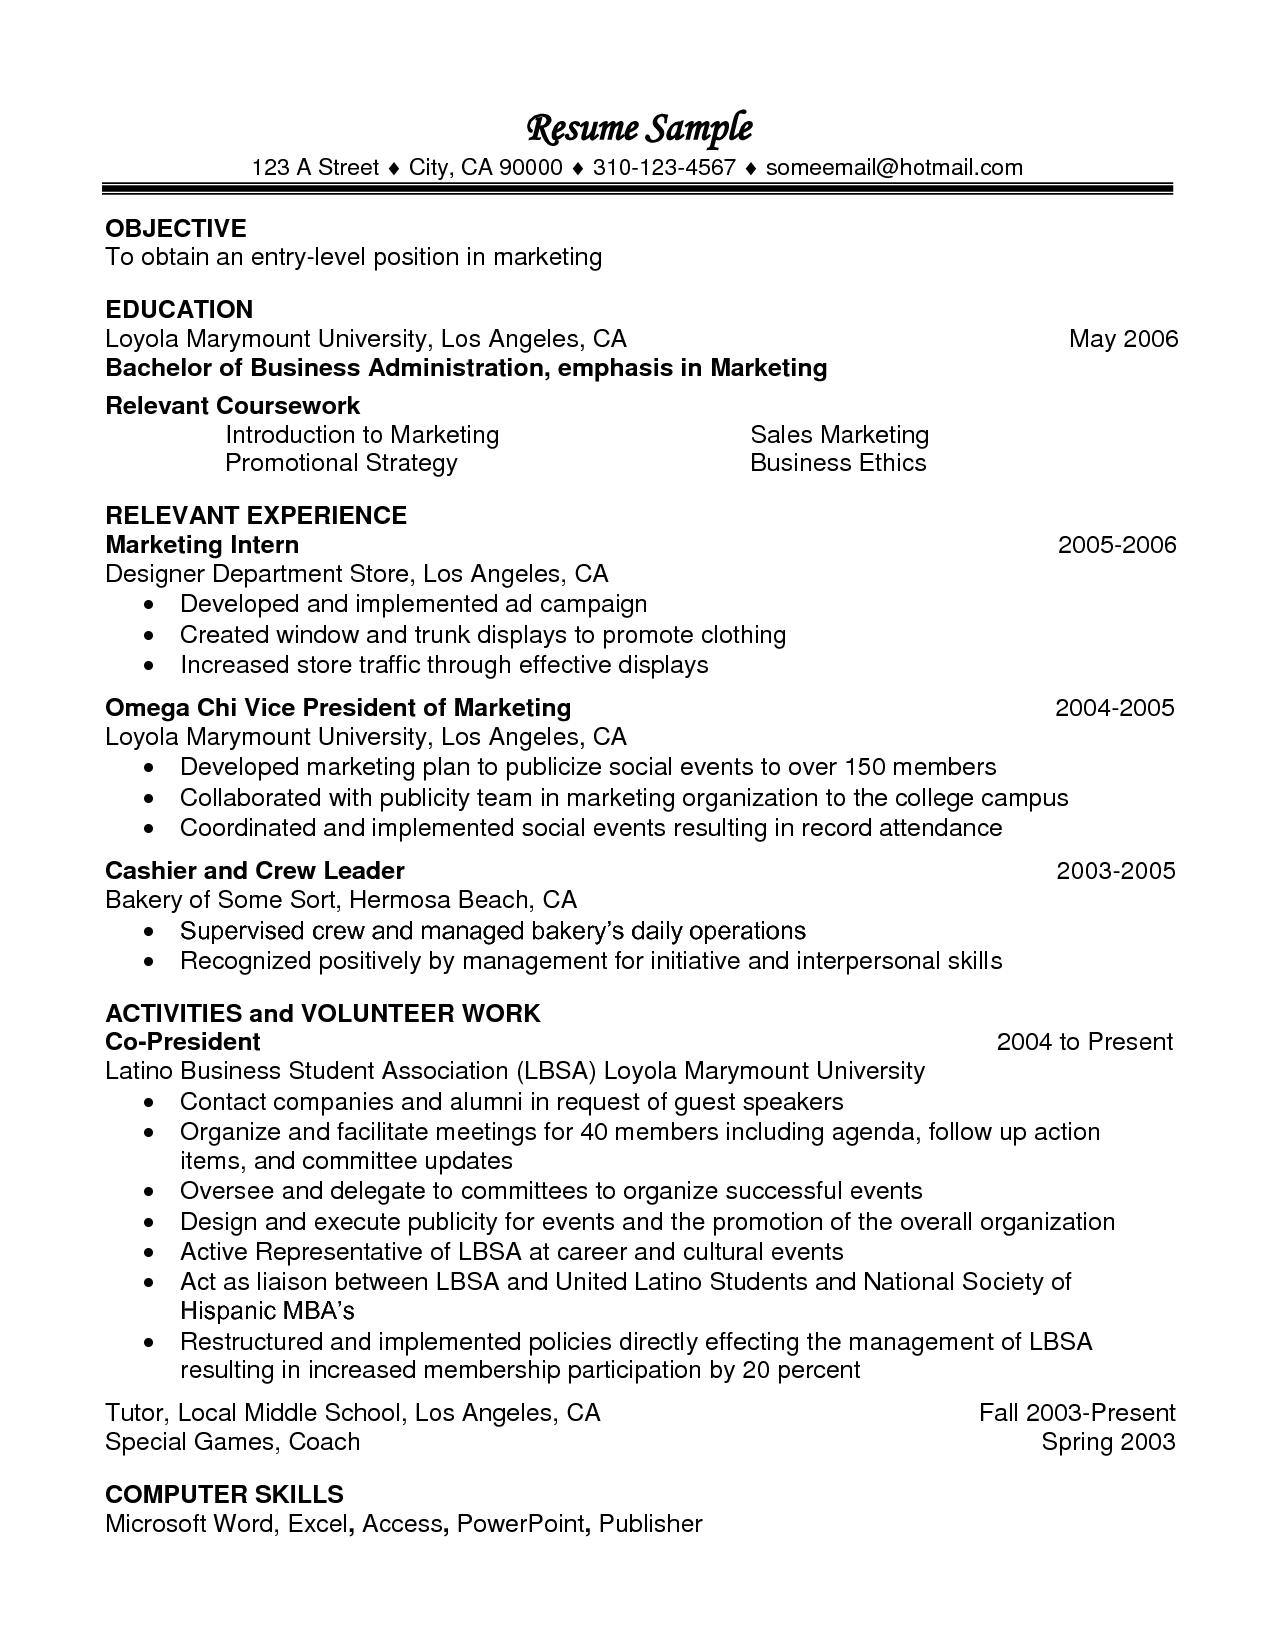 Relevant Coursework In Resume Examplecareer Resume Template Career Resume Template